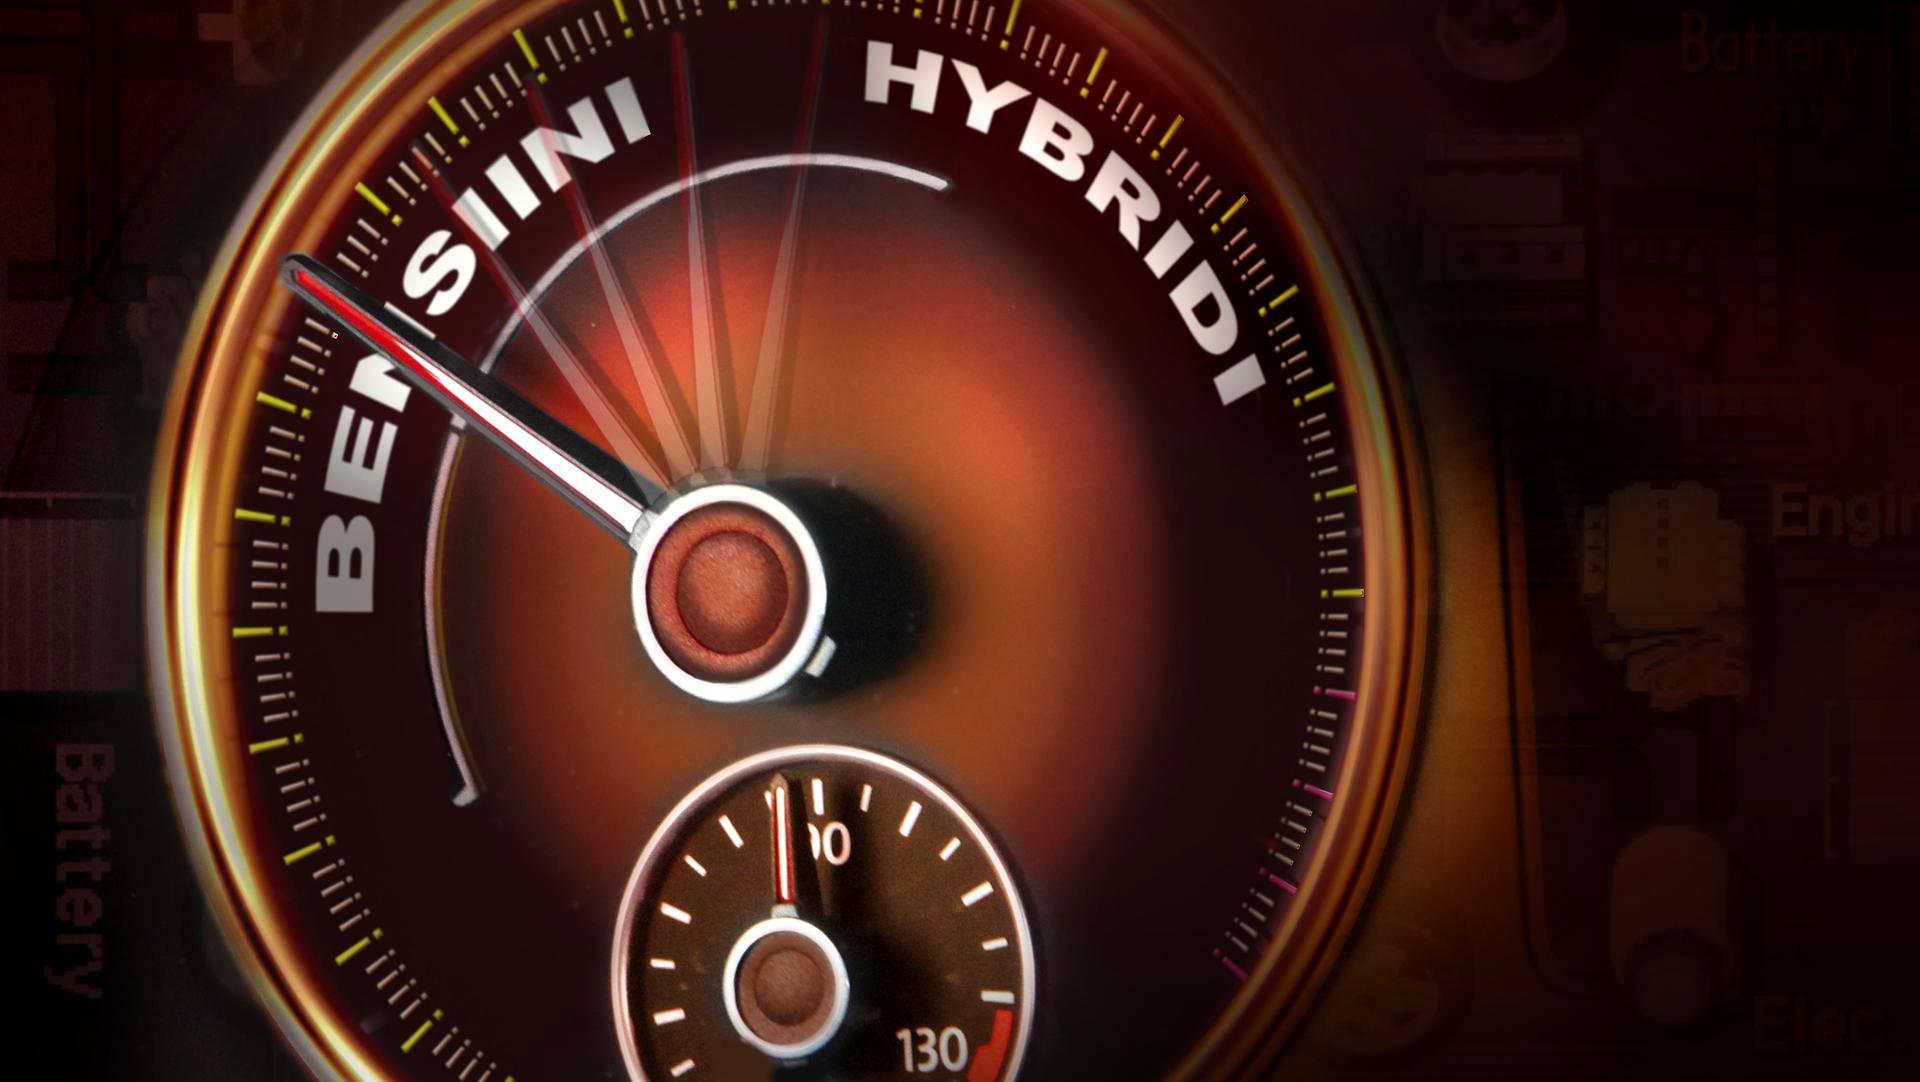 Hybridiautojen suosio on nousussa.